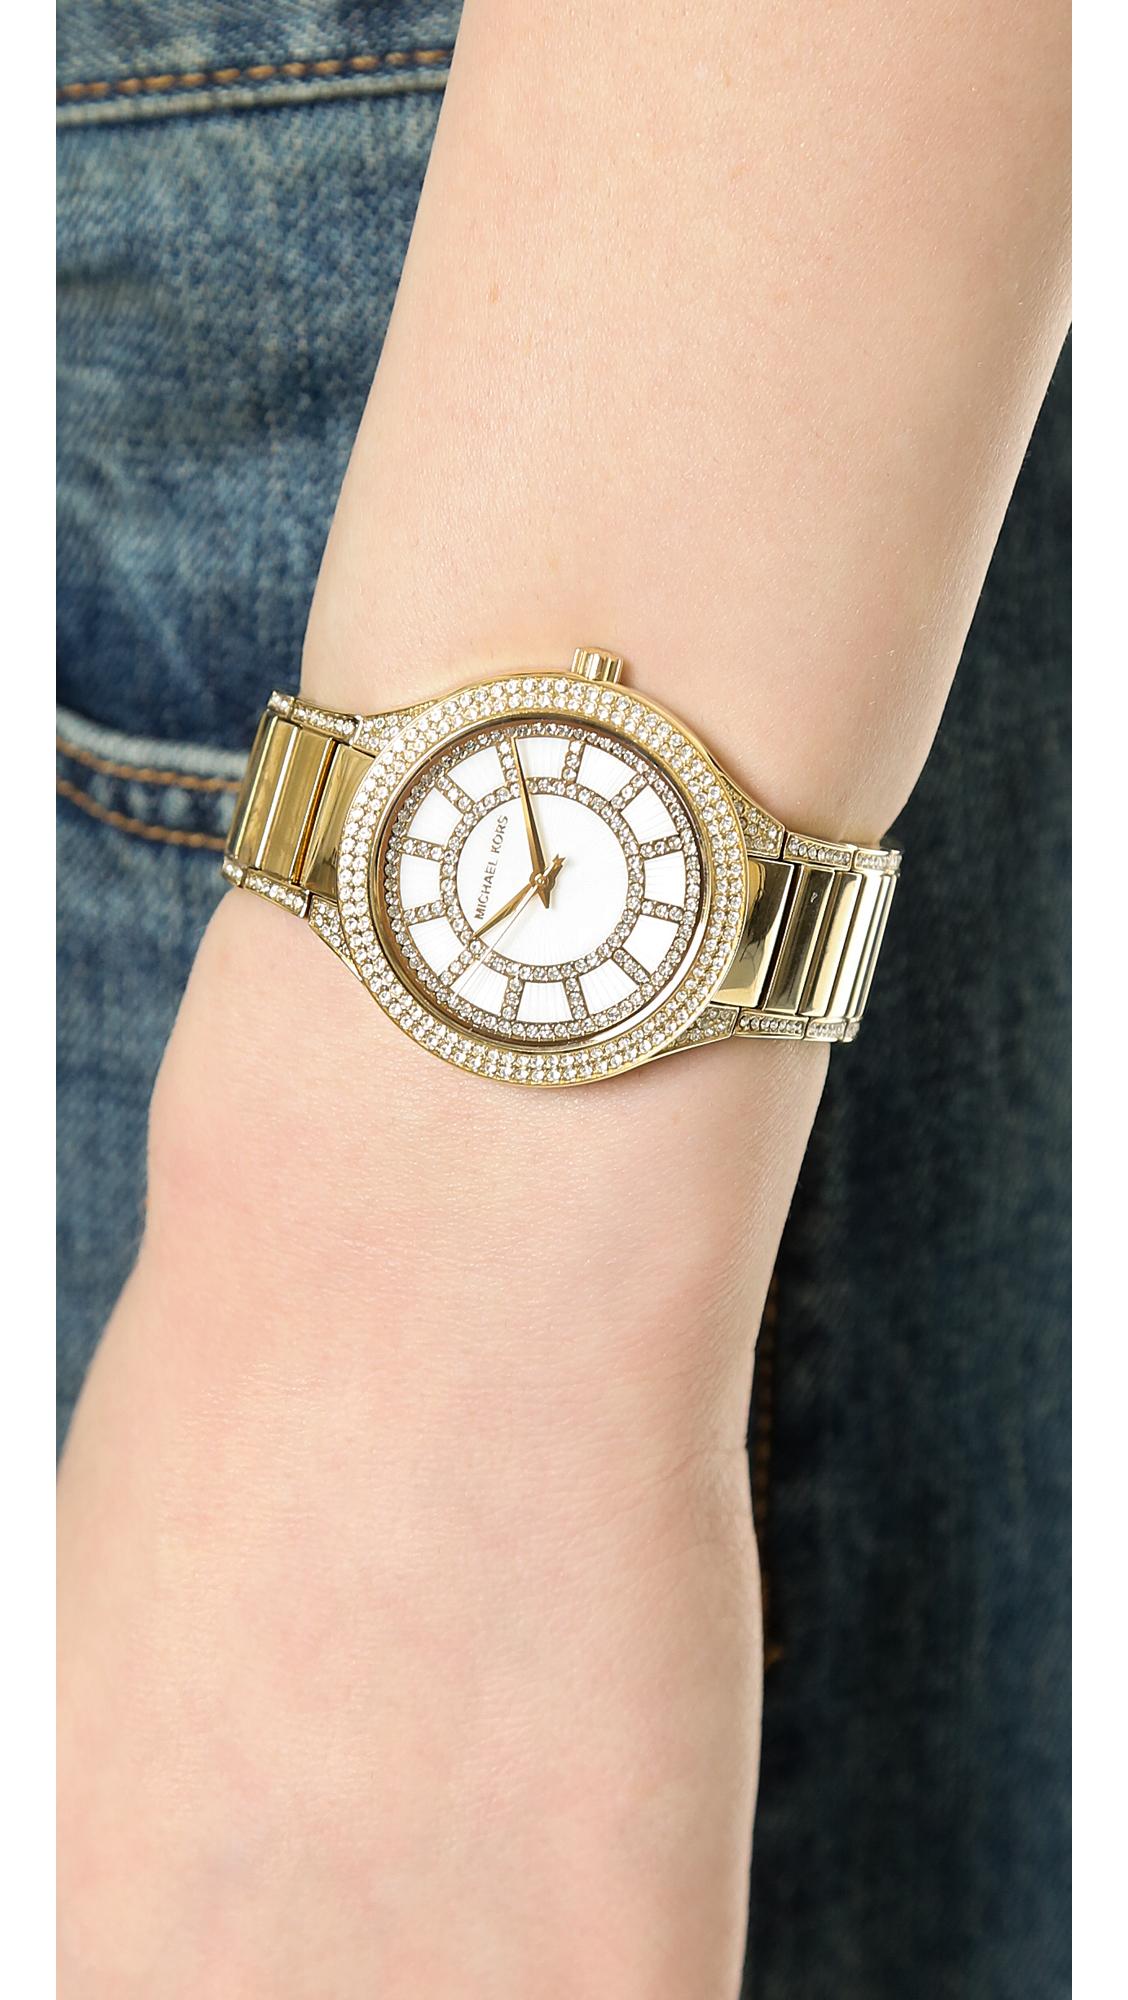 5886a03c9ece Michael Kors Kerry Watch - Gold in Metallic - Lyst